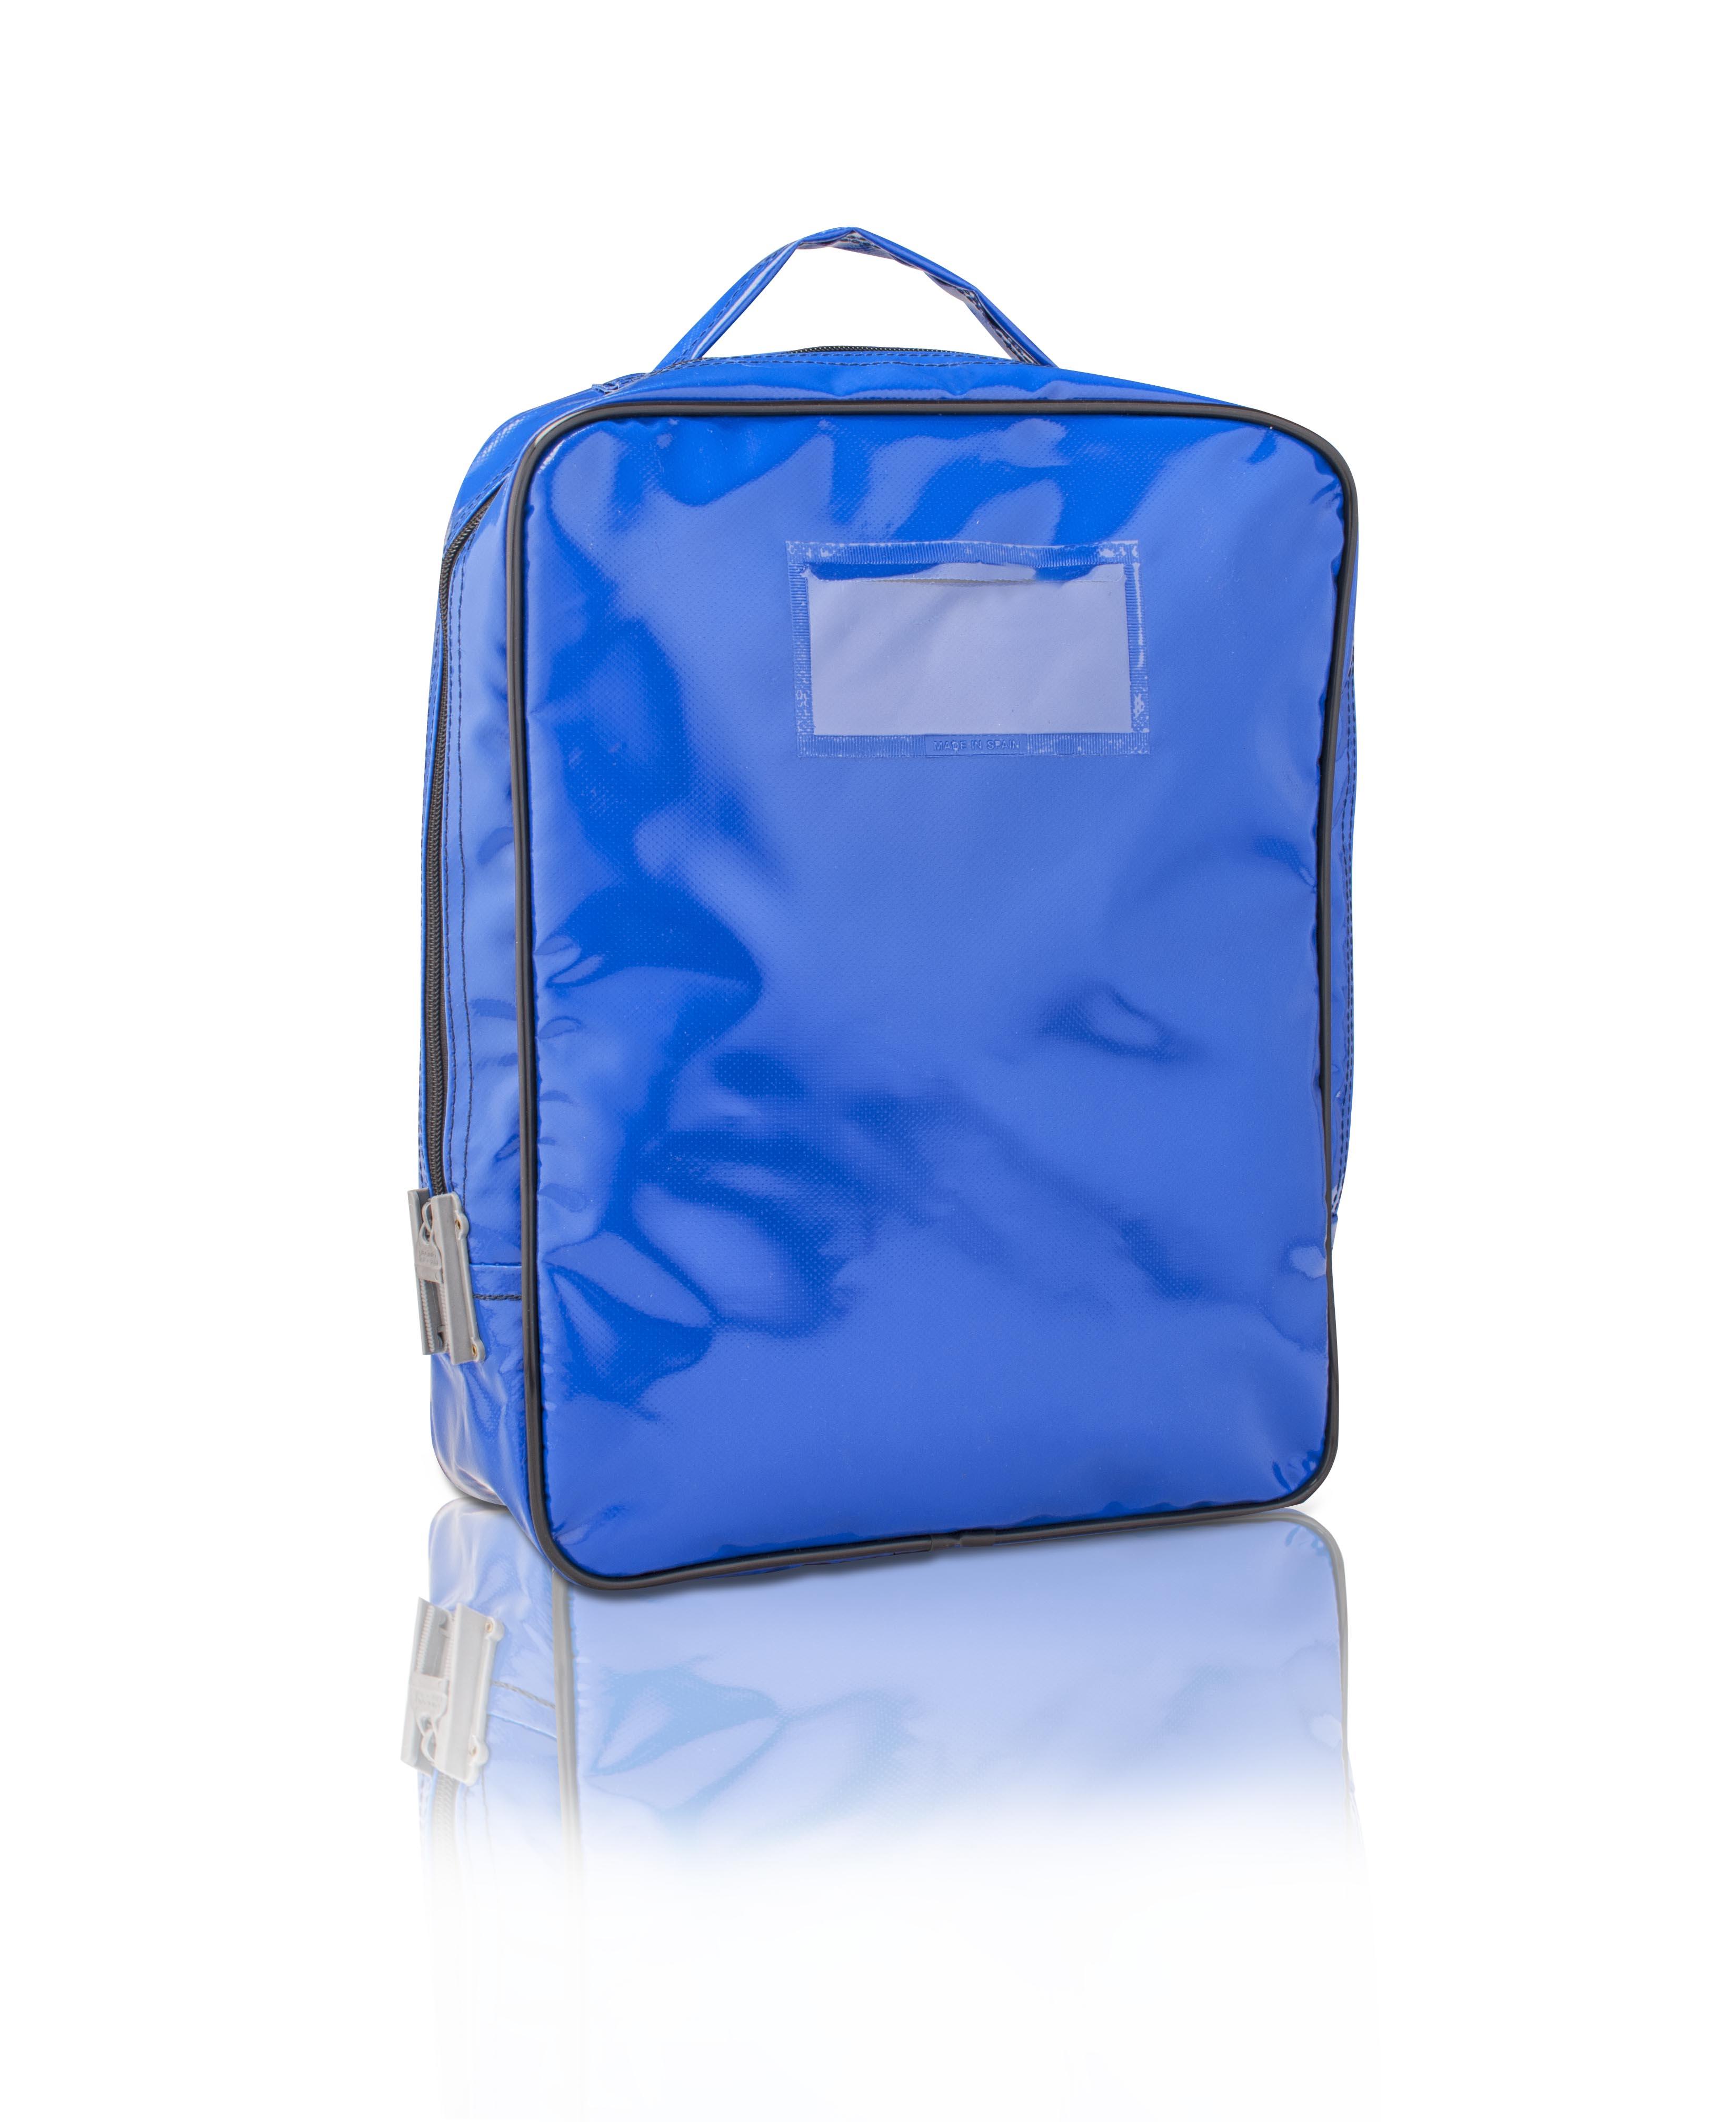 Precintia Security Bags